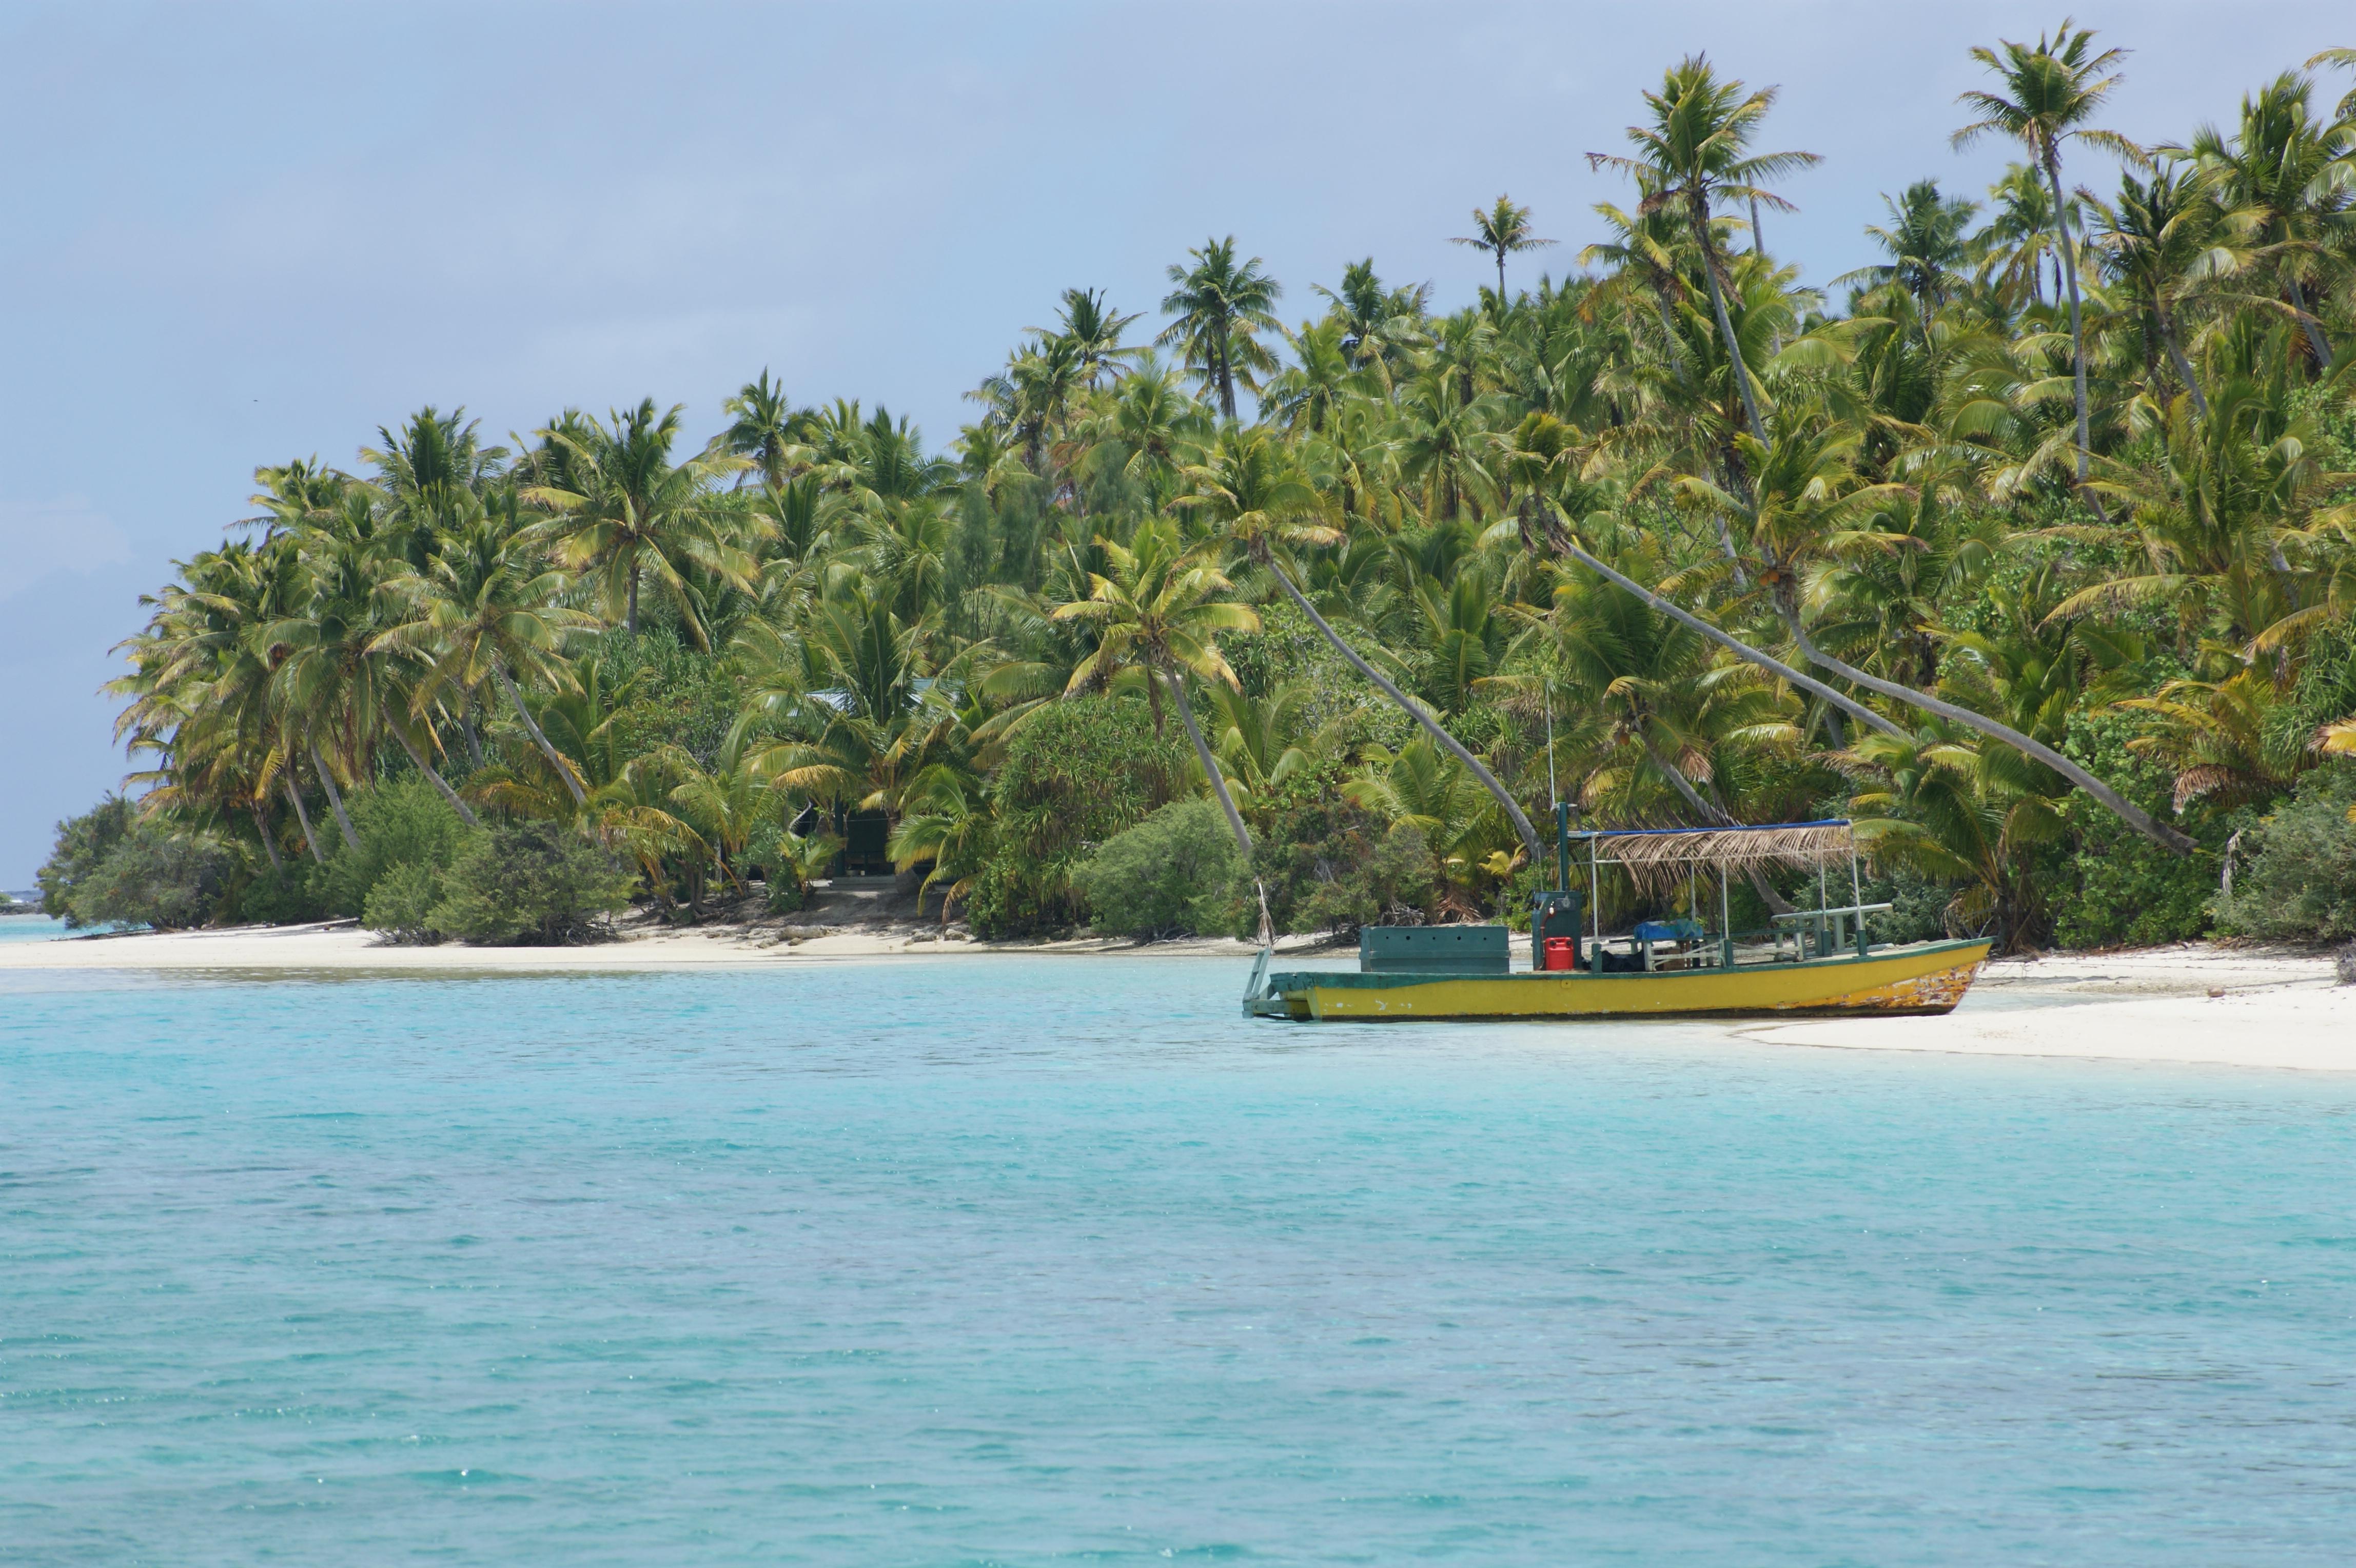 Aitutaki_Cook_Islands_-_Photo_by_Dustin-smith_on_Flickr.jpg?1564992727